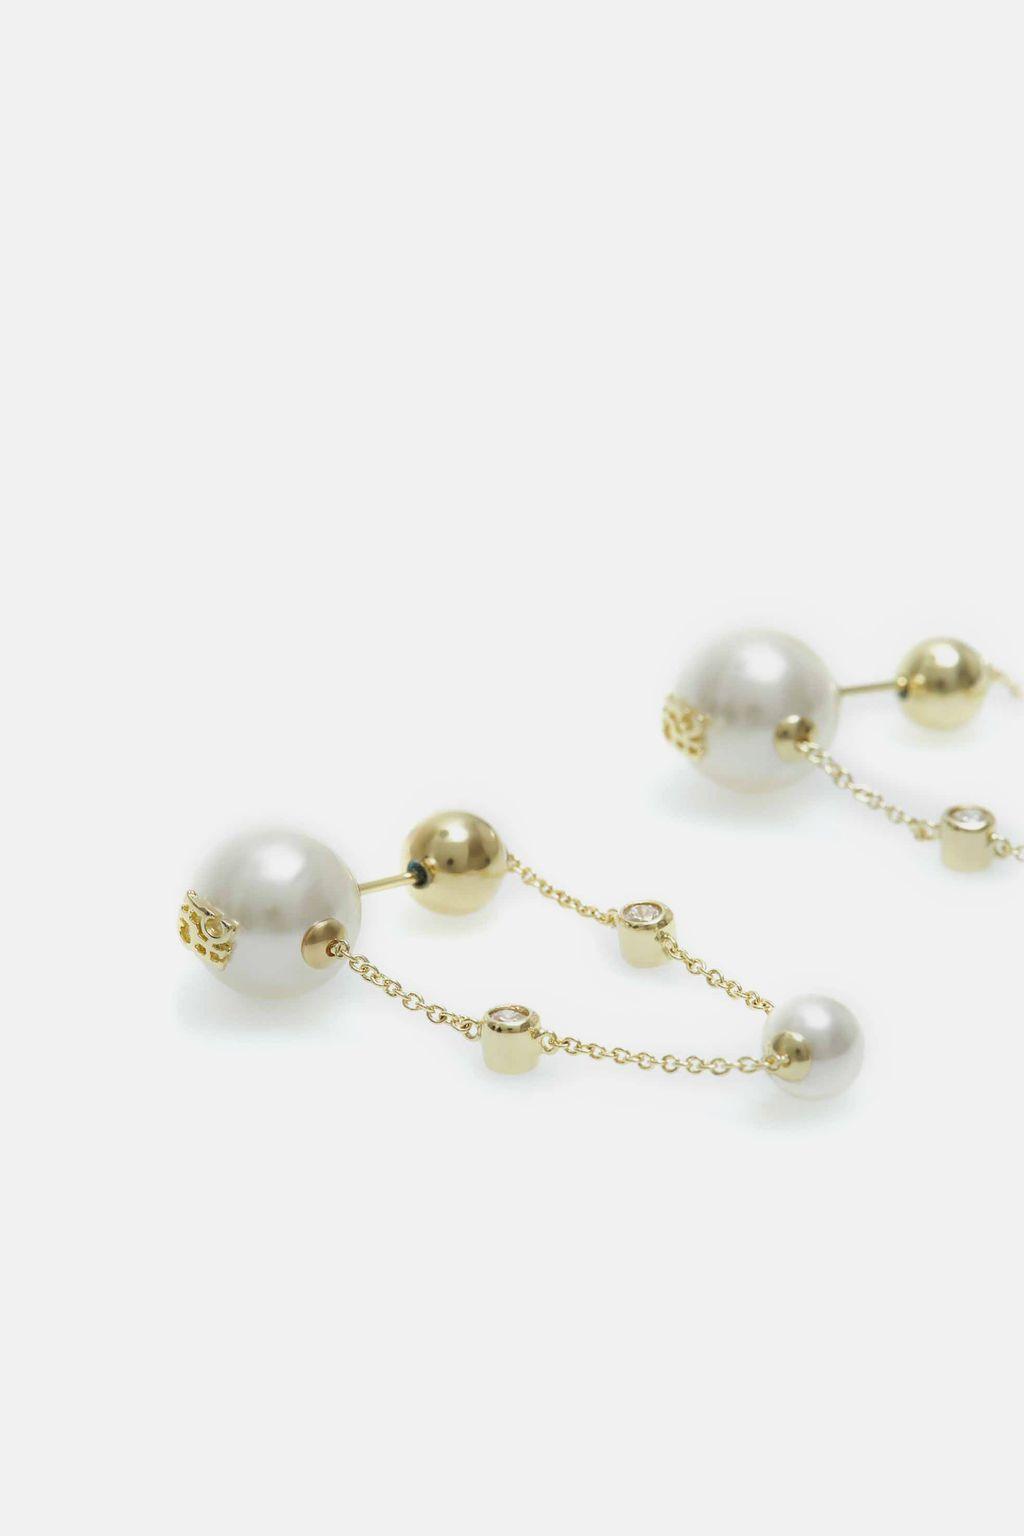 Balance drop earrings